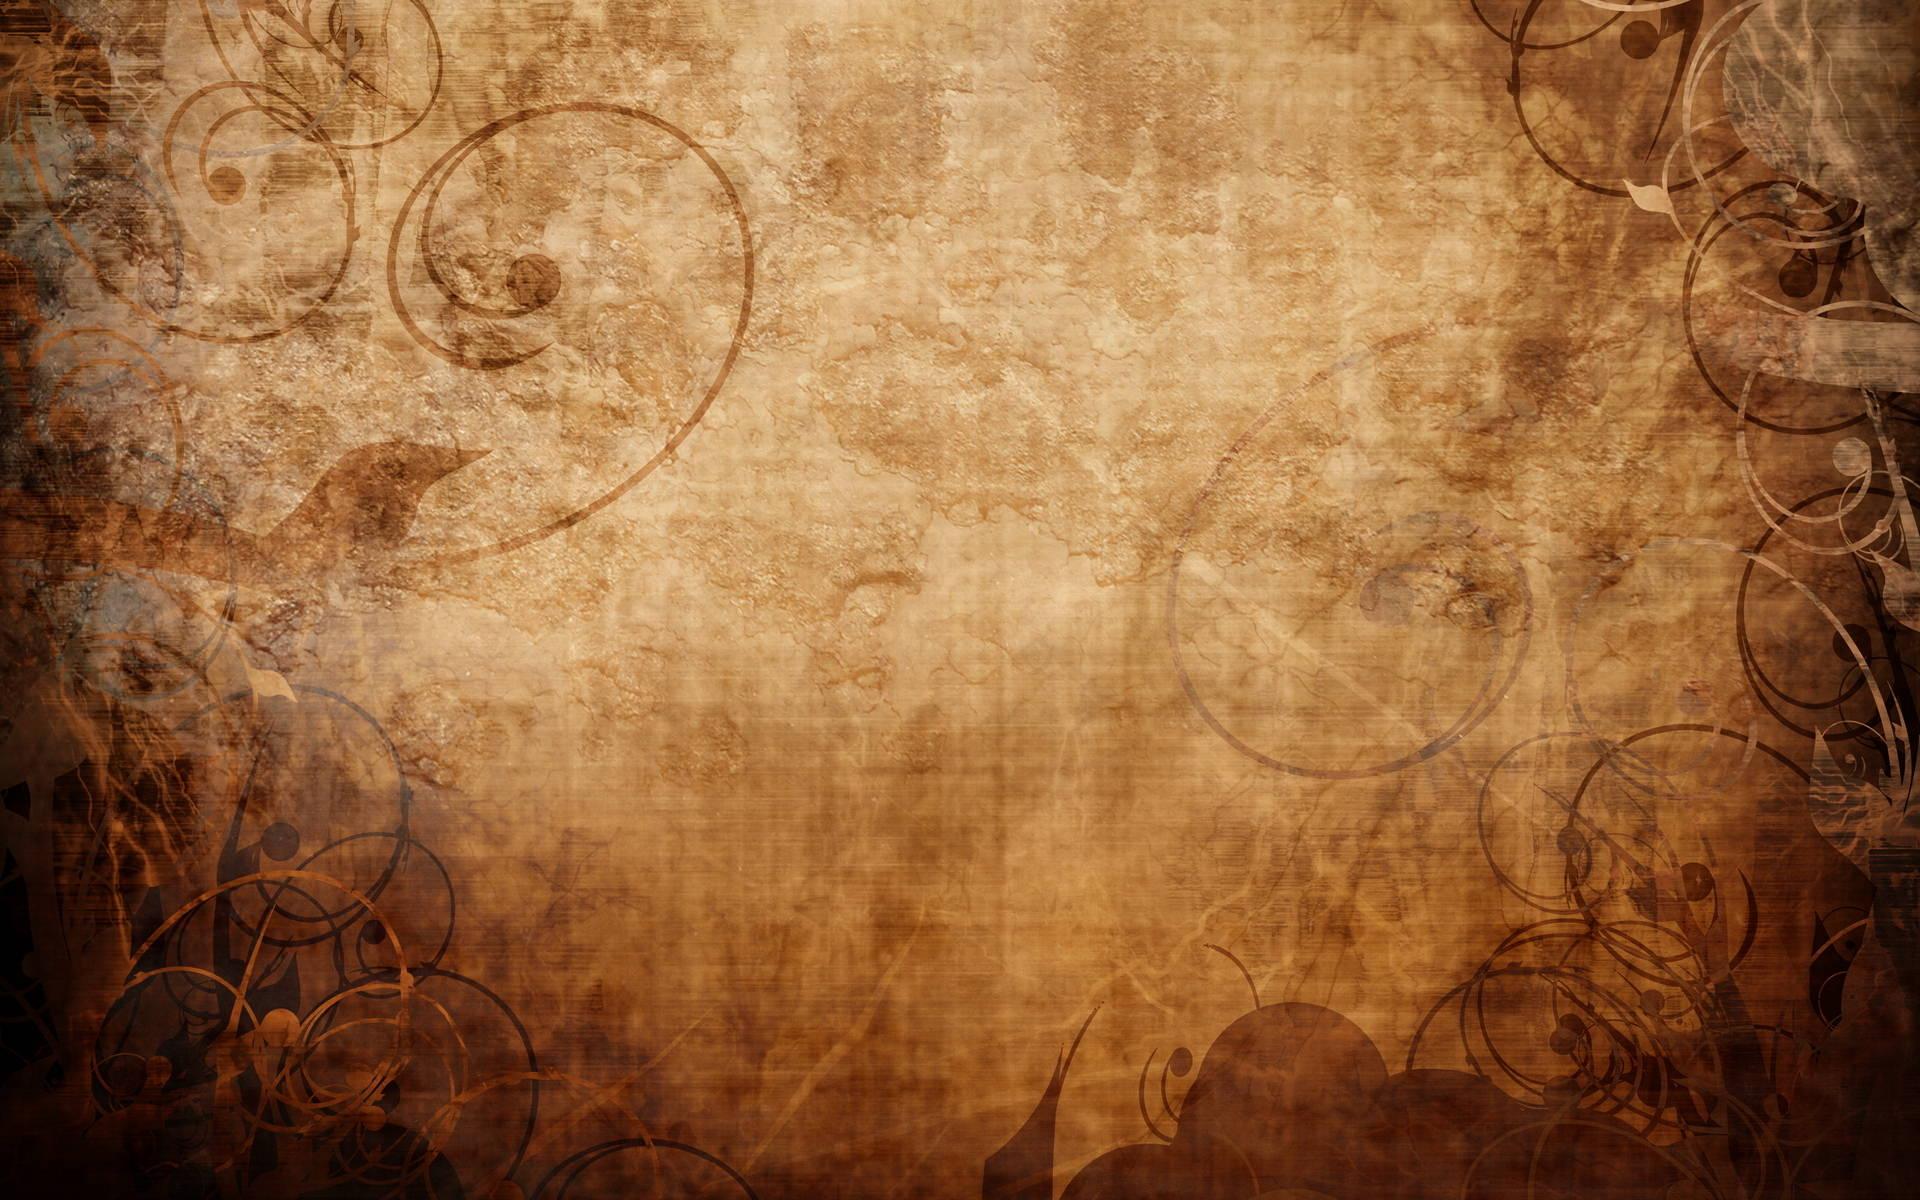 Fond d'écran vintage brun